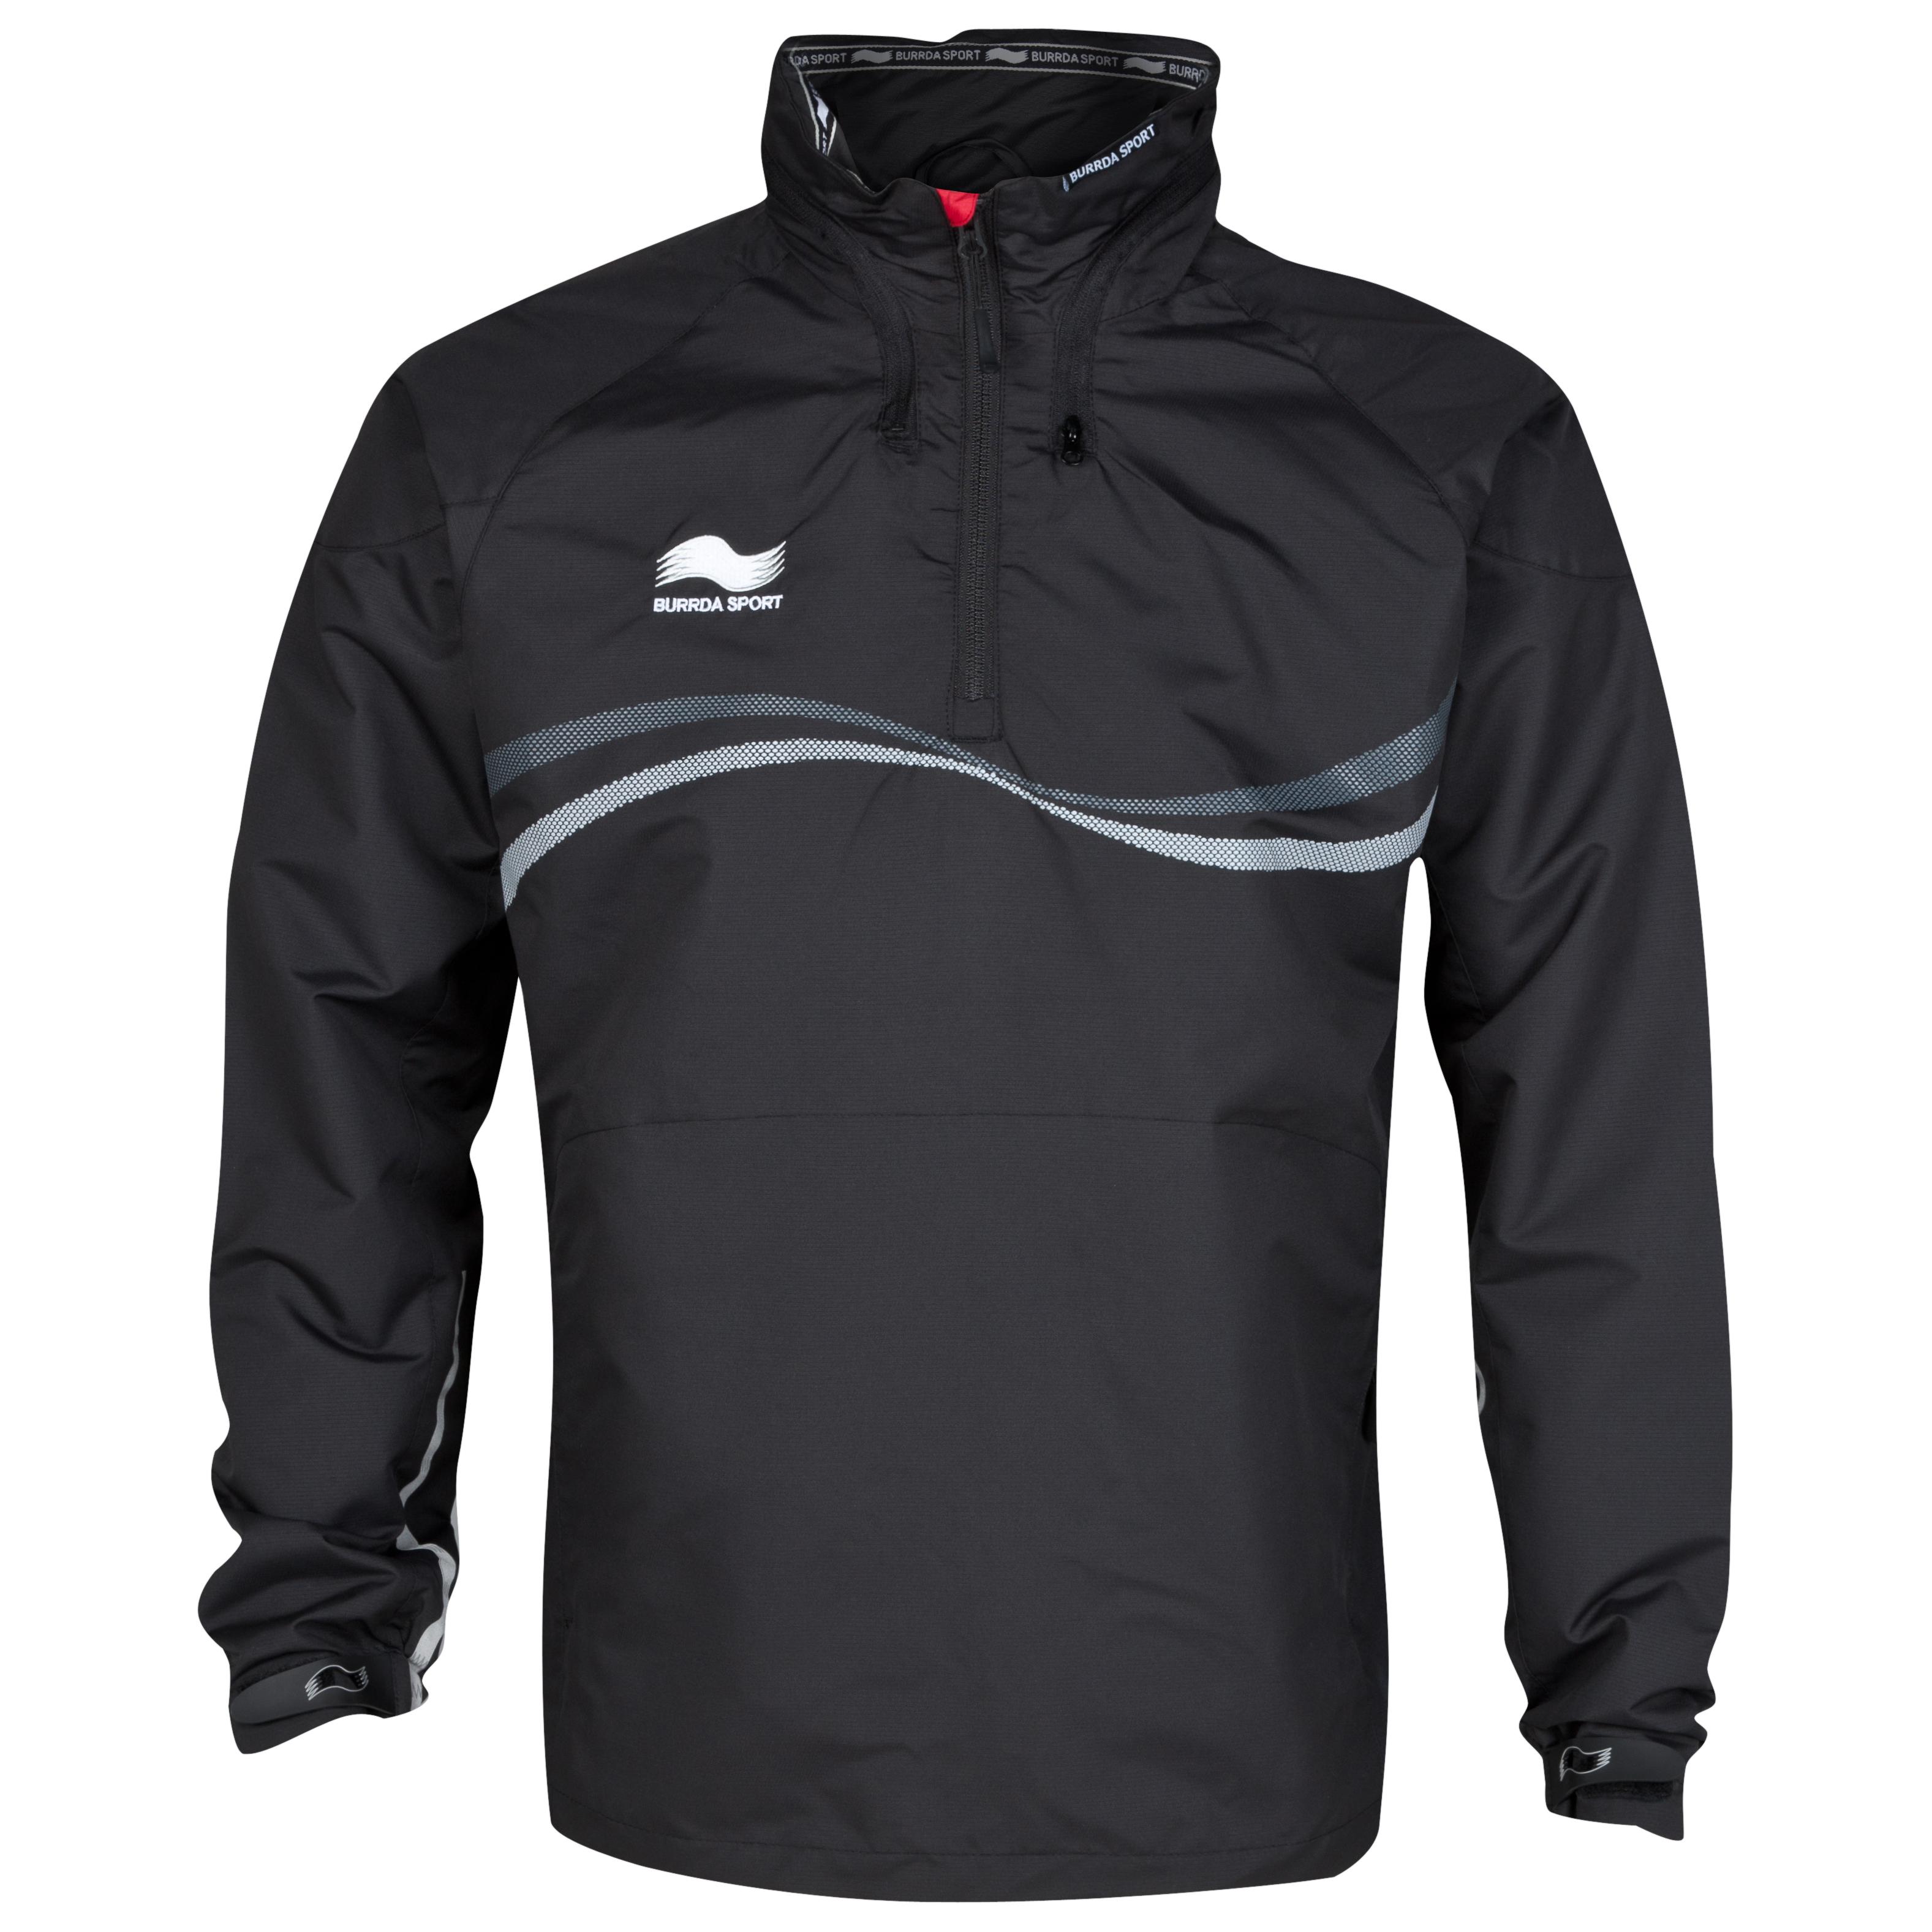 Burrda Sport Rugby 1/4 Zip Rain Jacket - Black